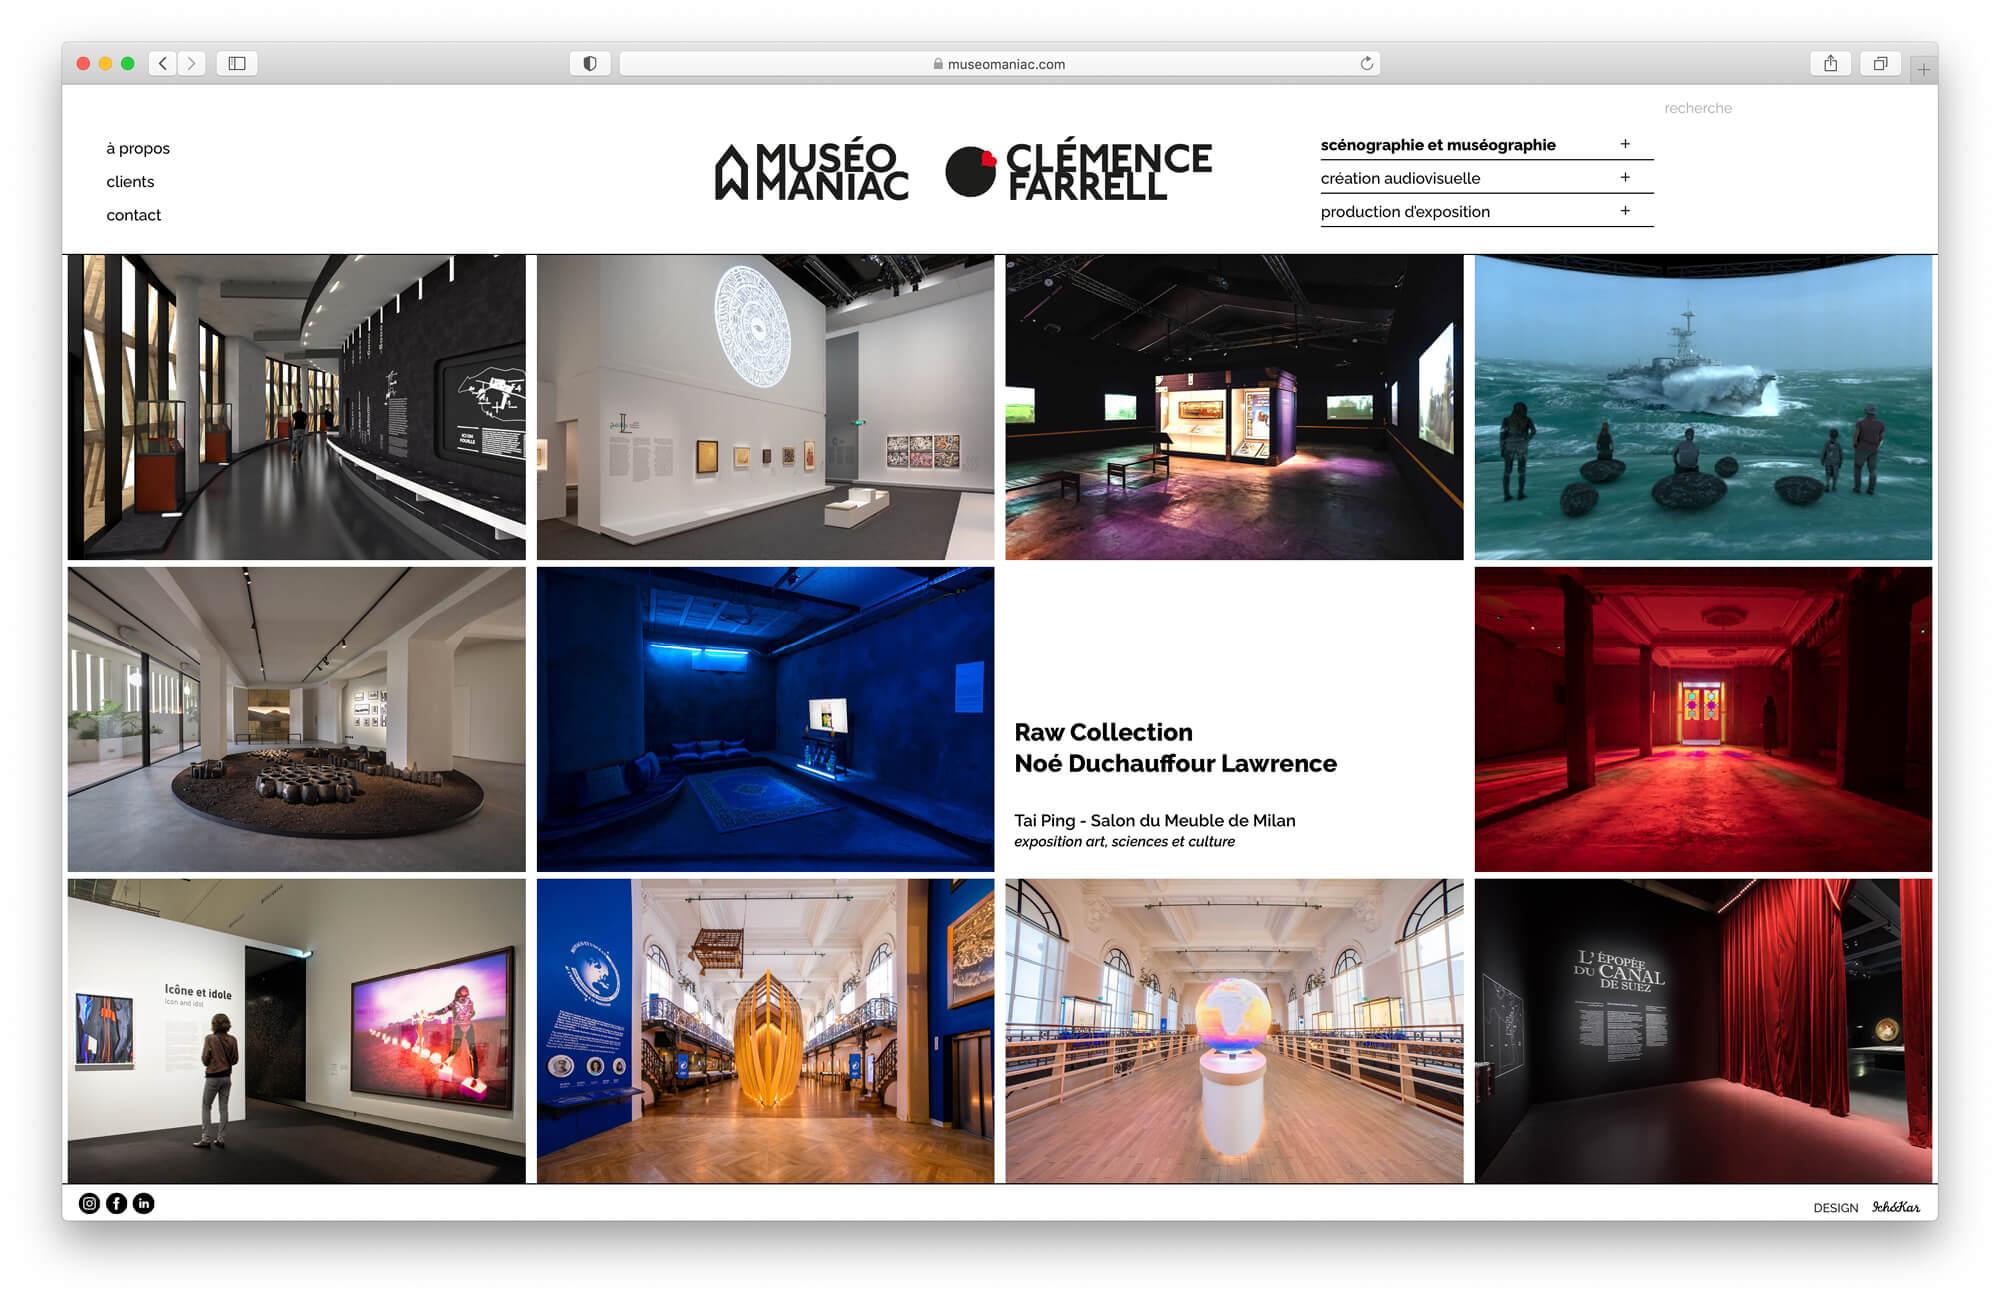 clemence-farrell-museomaniac-site-web-scenographie-ichetkar9